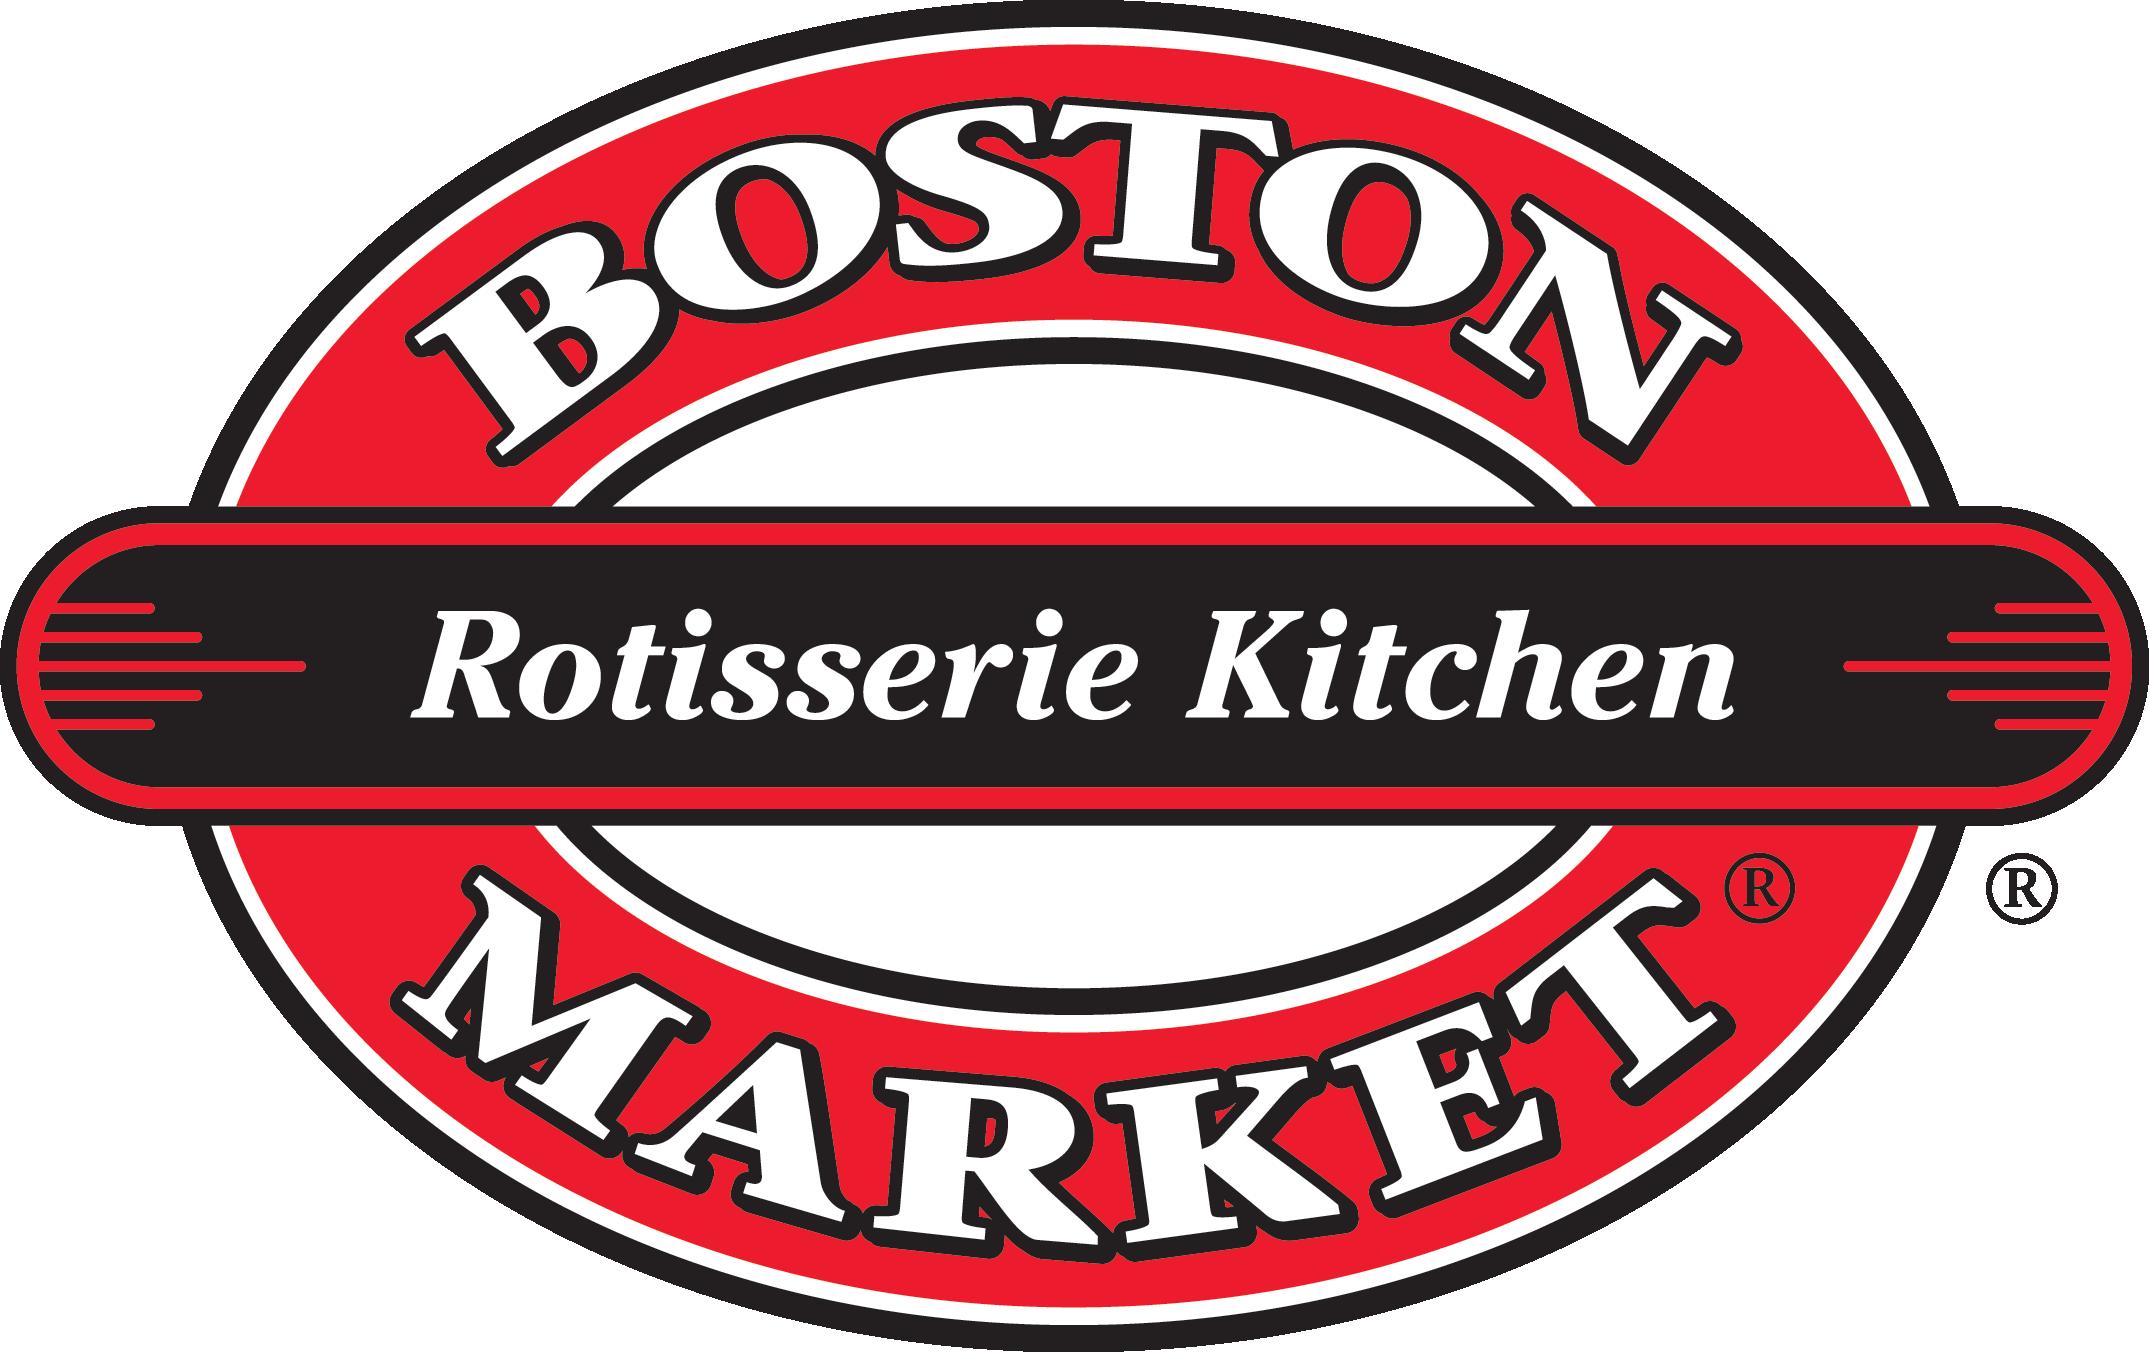 Boston Market BOGO 8/6 and 8/7 only code 37642